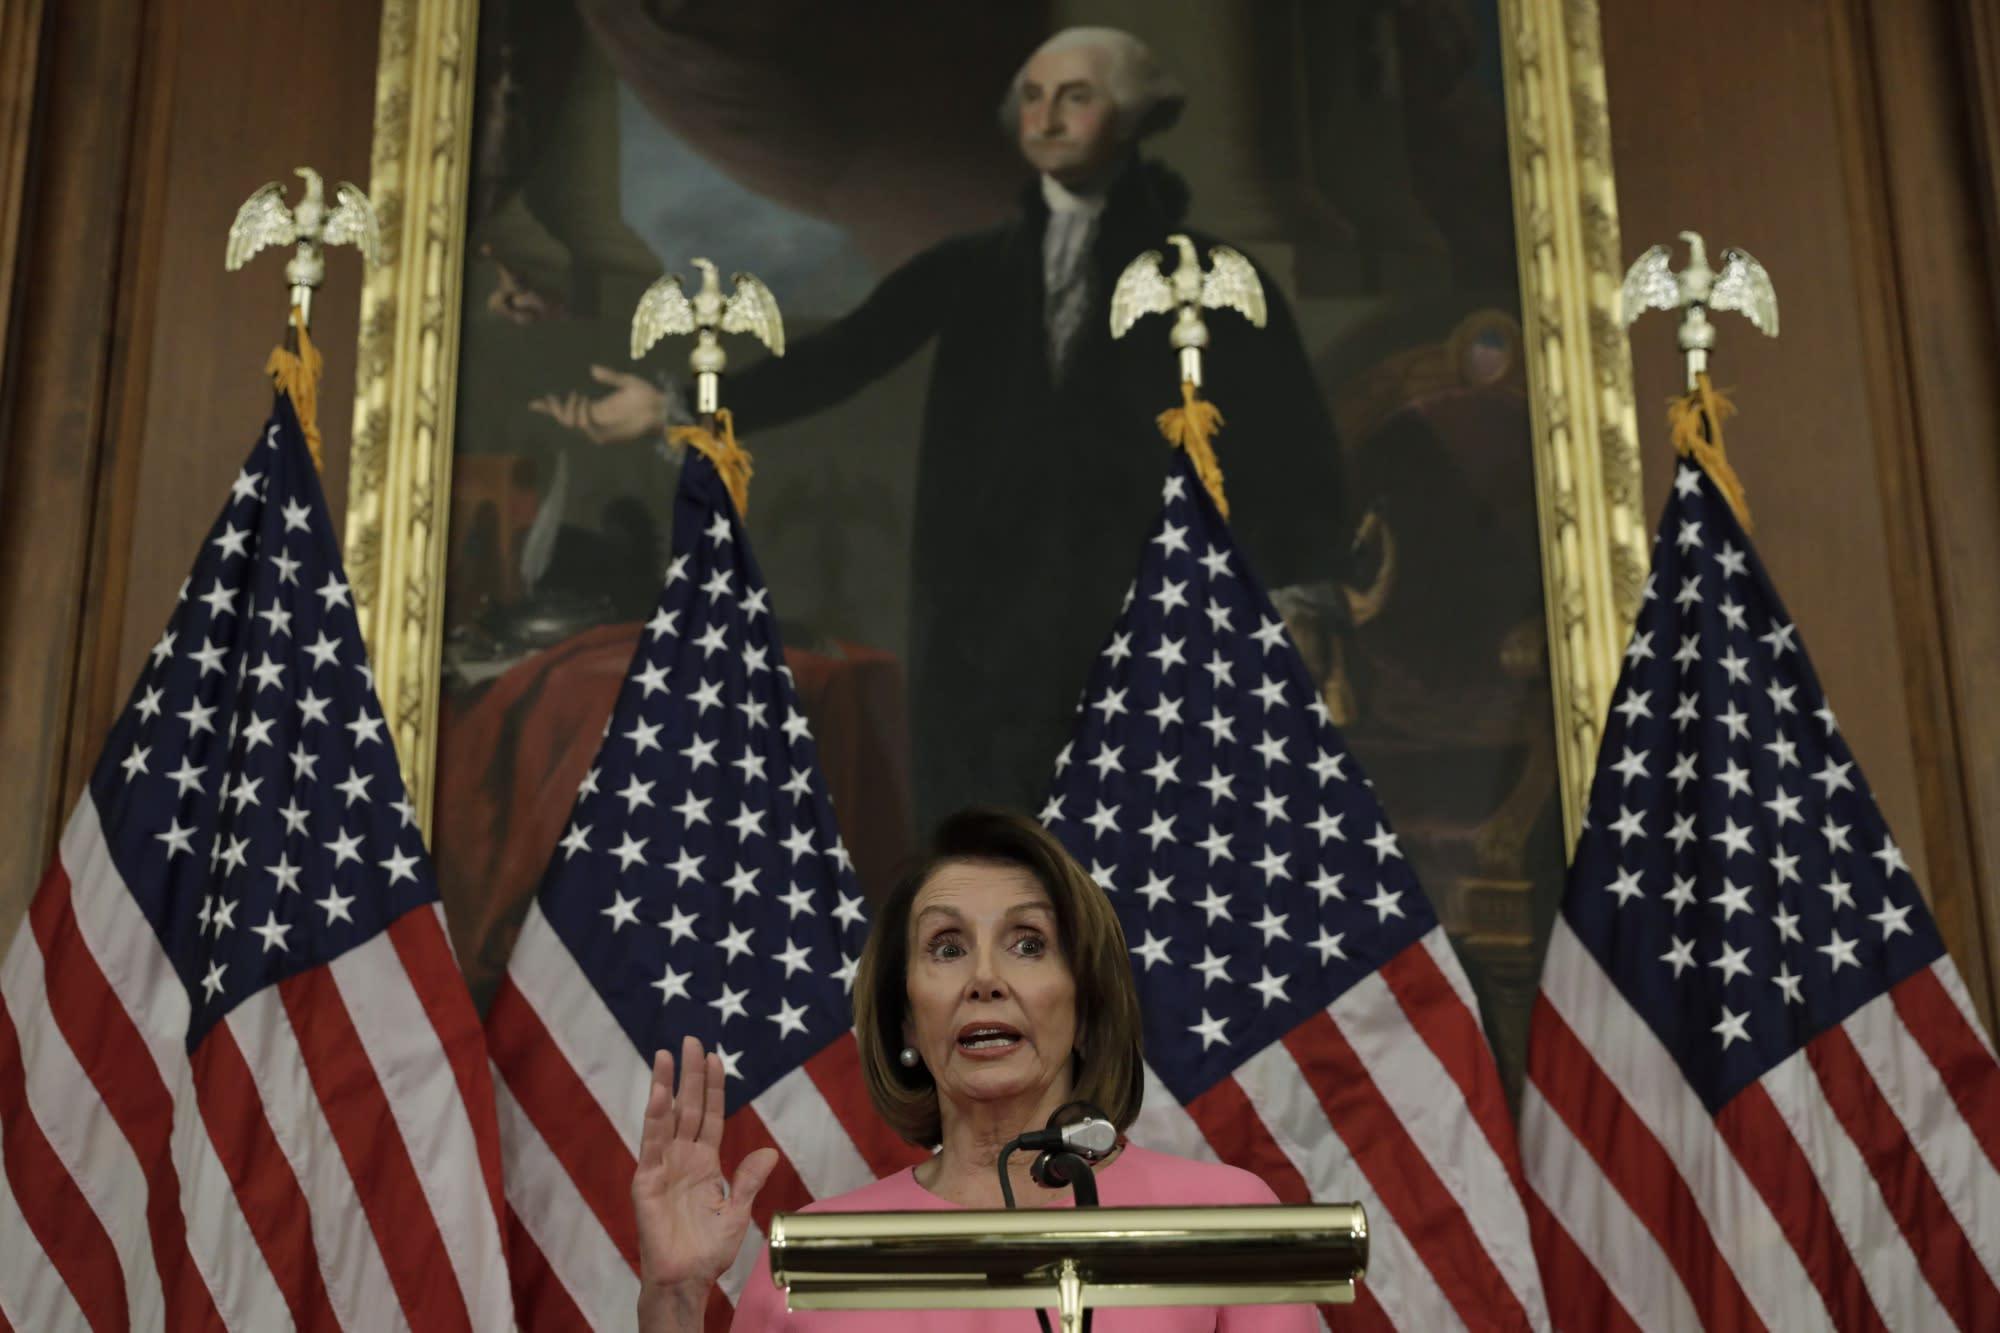 Pelosi Urges Democrats to Unite Ahead of First Leadership Vote